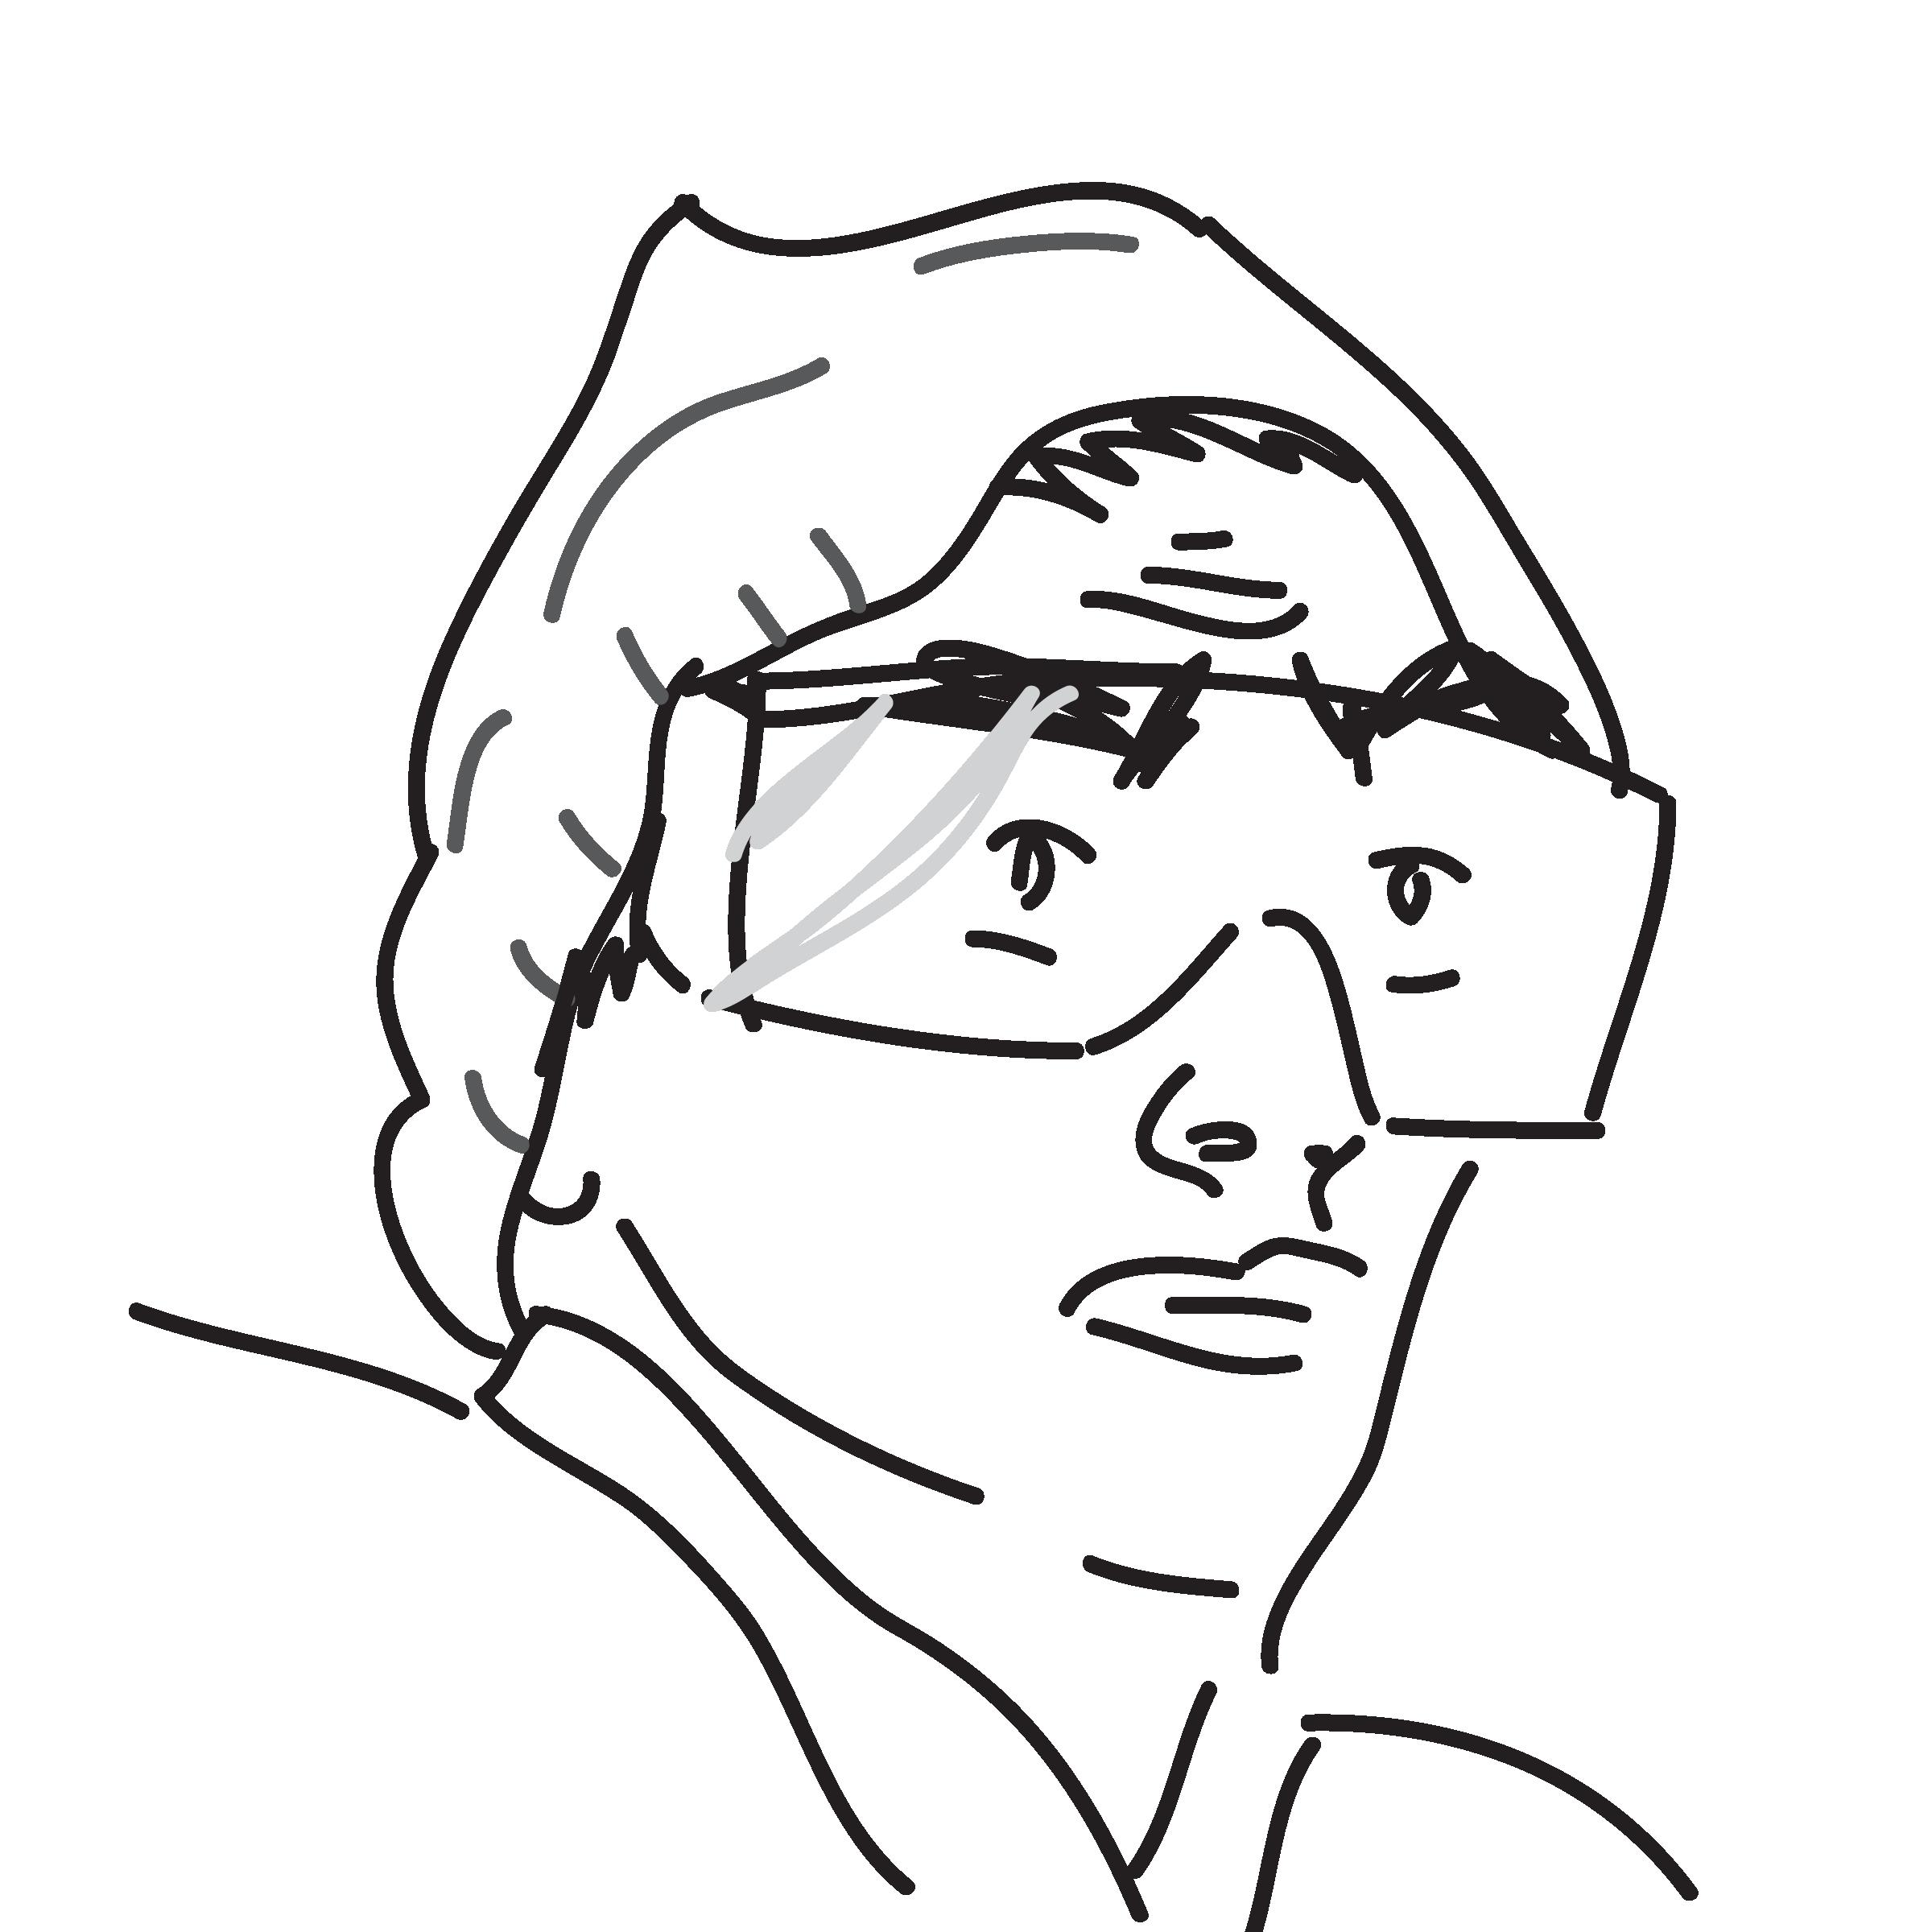 Dwight@2x.png